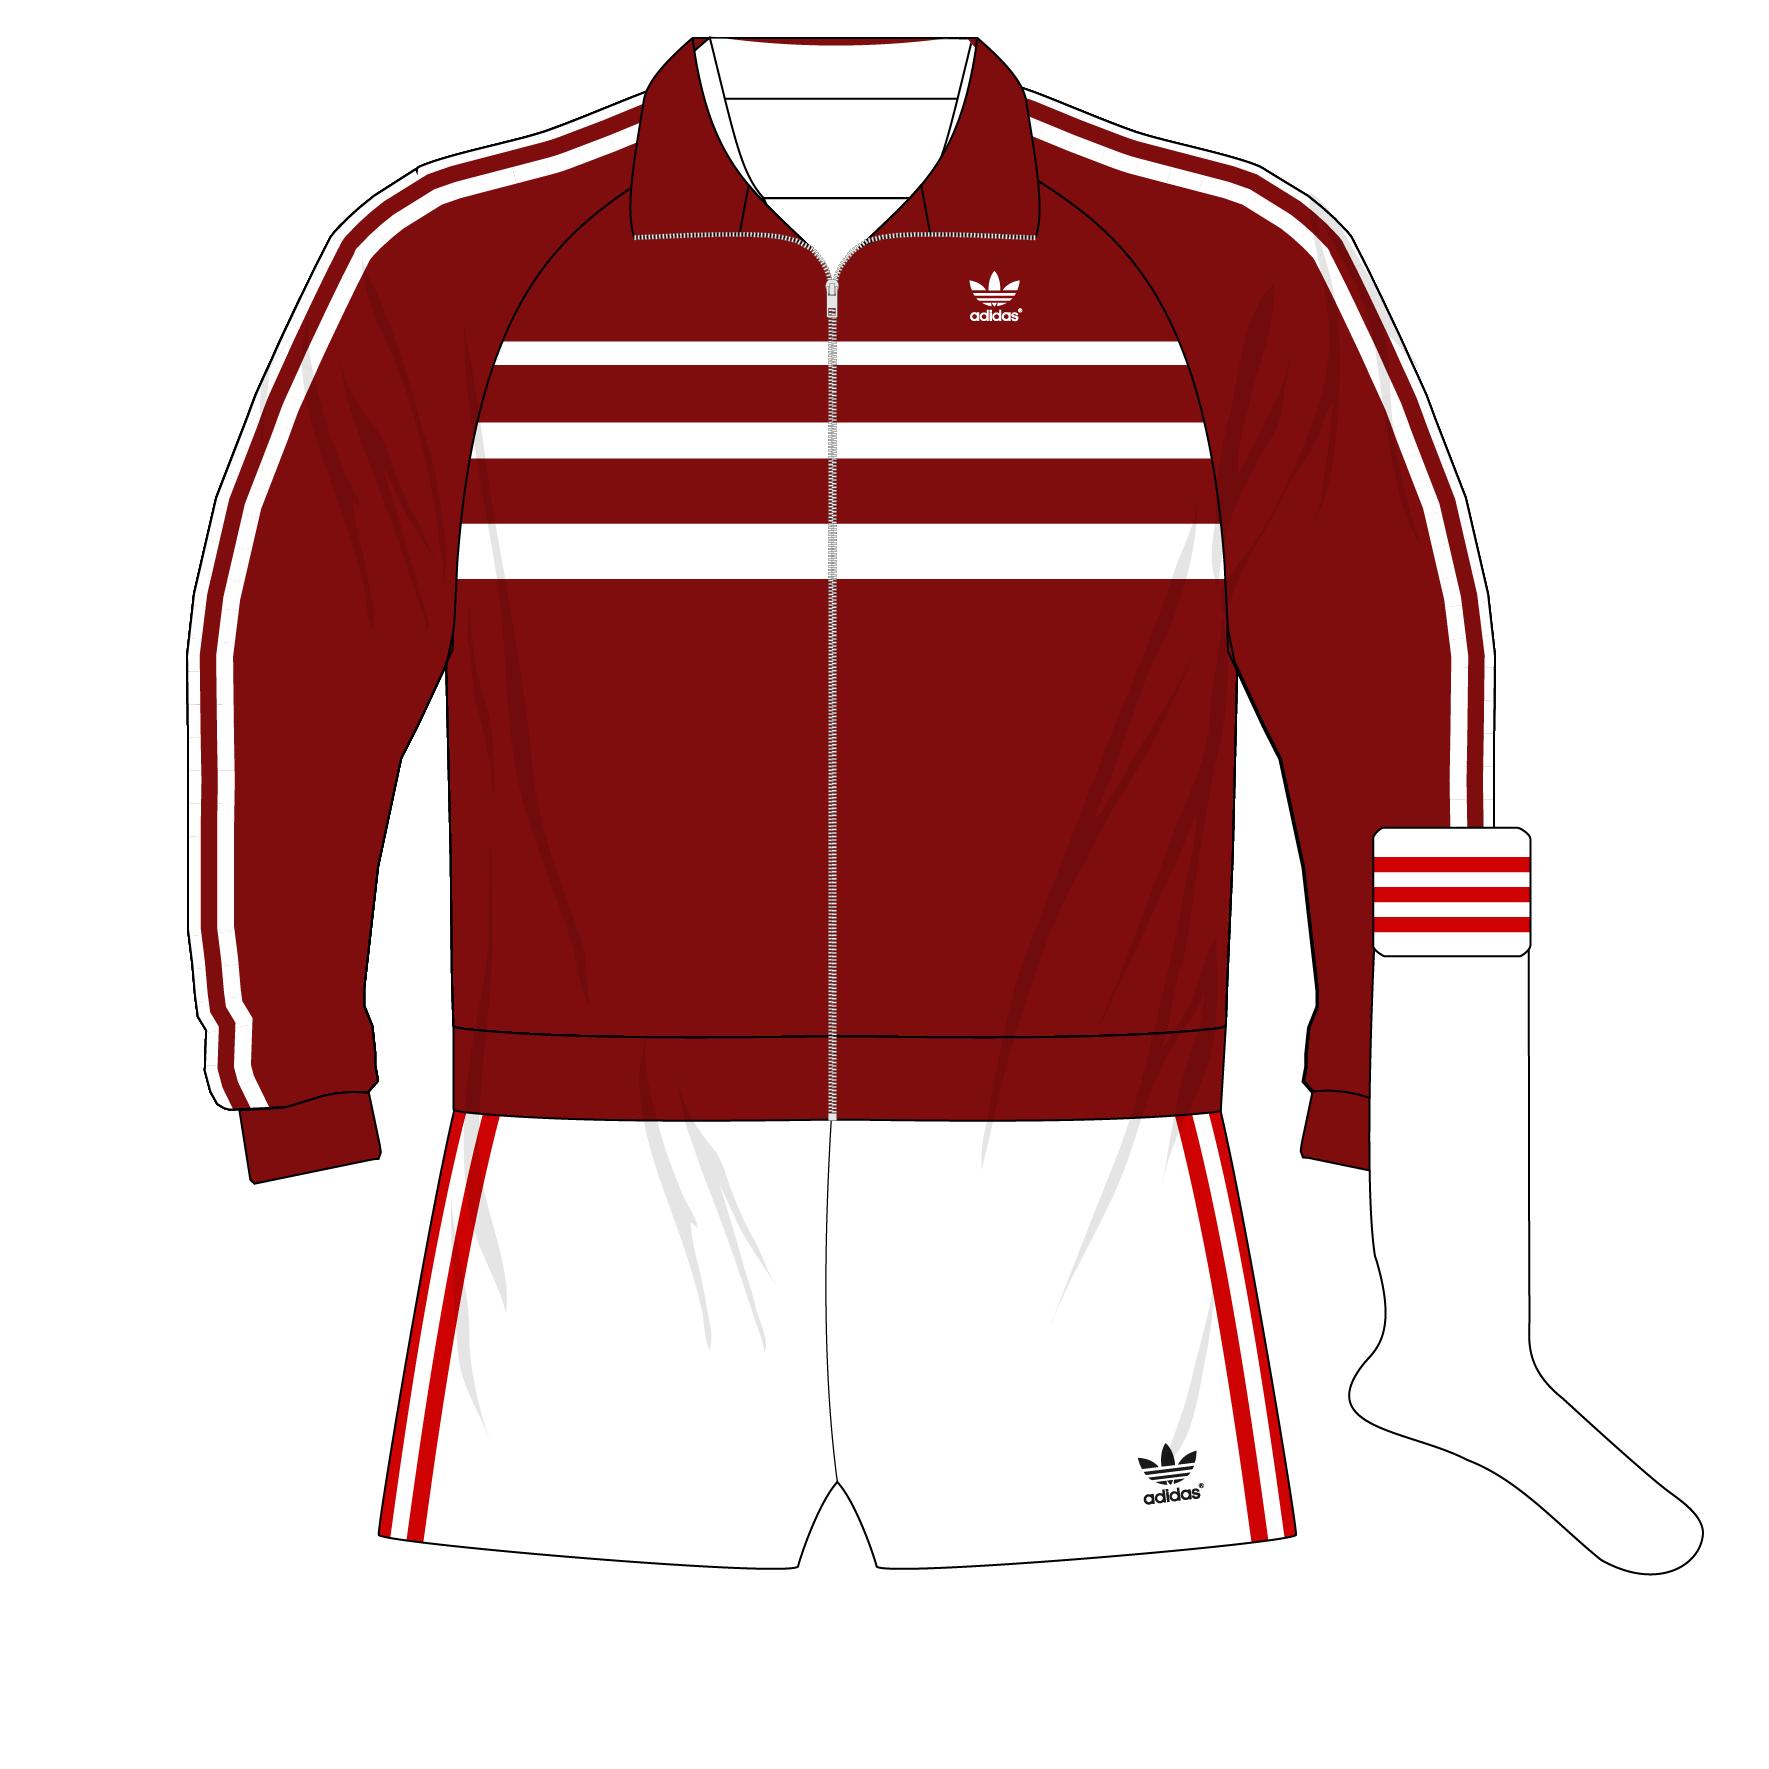 Hungary-adidas-1986-tracksuit-Netherlands-01